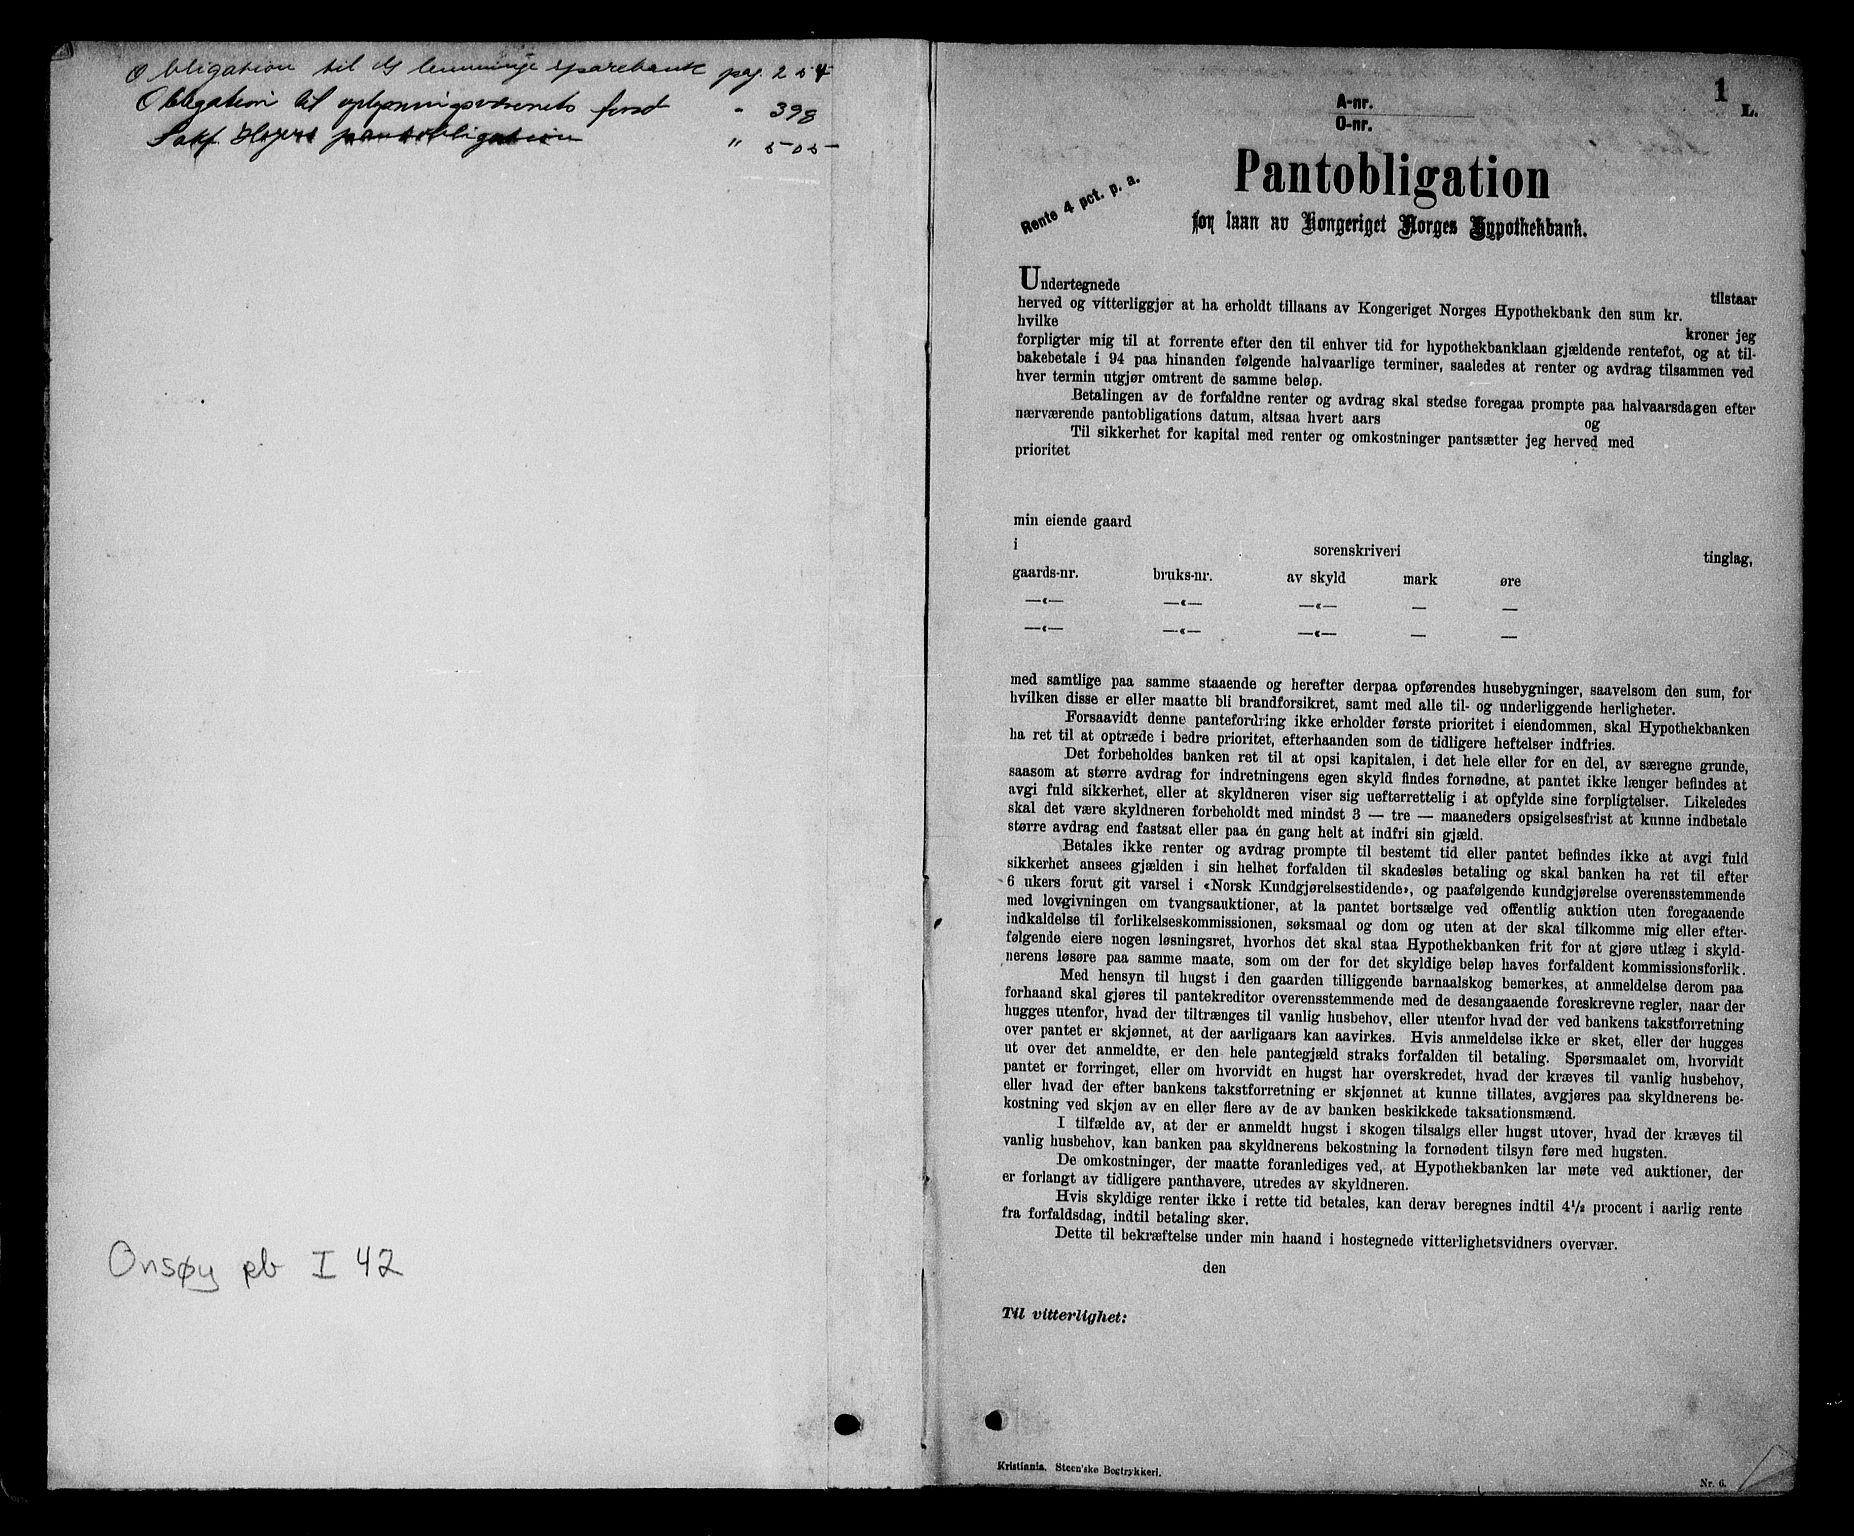 SAO, Onsøy sorenskriveri, G/Ga/Gaa/L0042: Pantebok nr. I 42, 1912-1913, s. 1